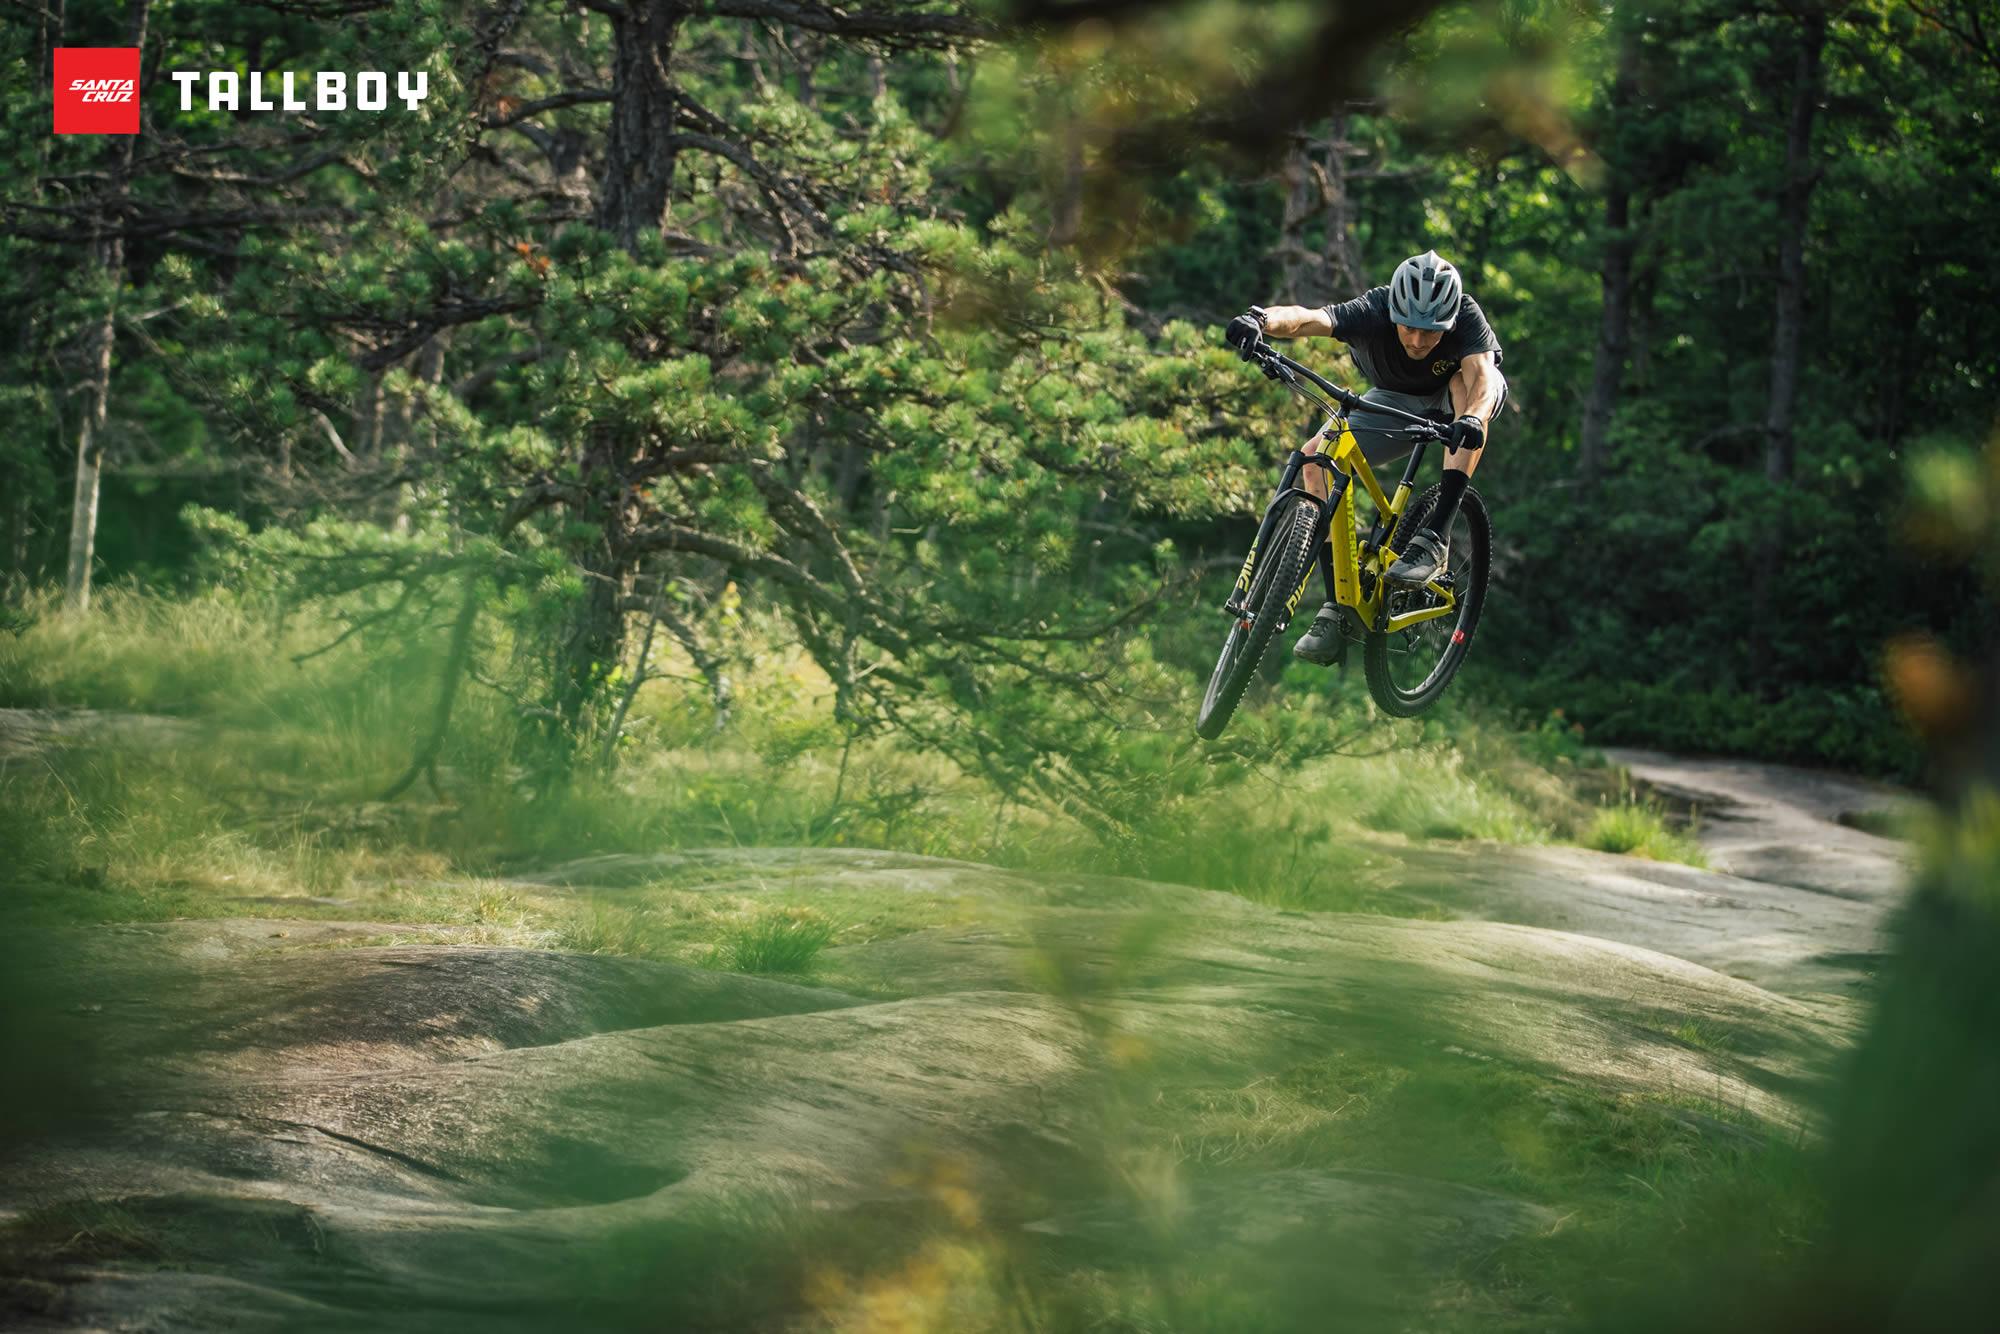 Bike Wallpapers - Top Free Bike Backgrounds - WallpaperAccess | 1334x2000